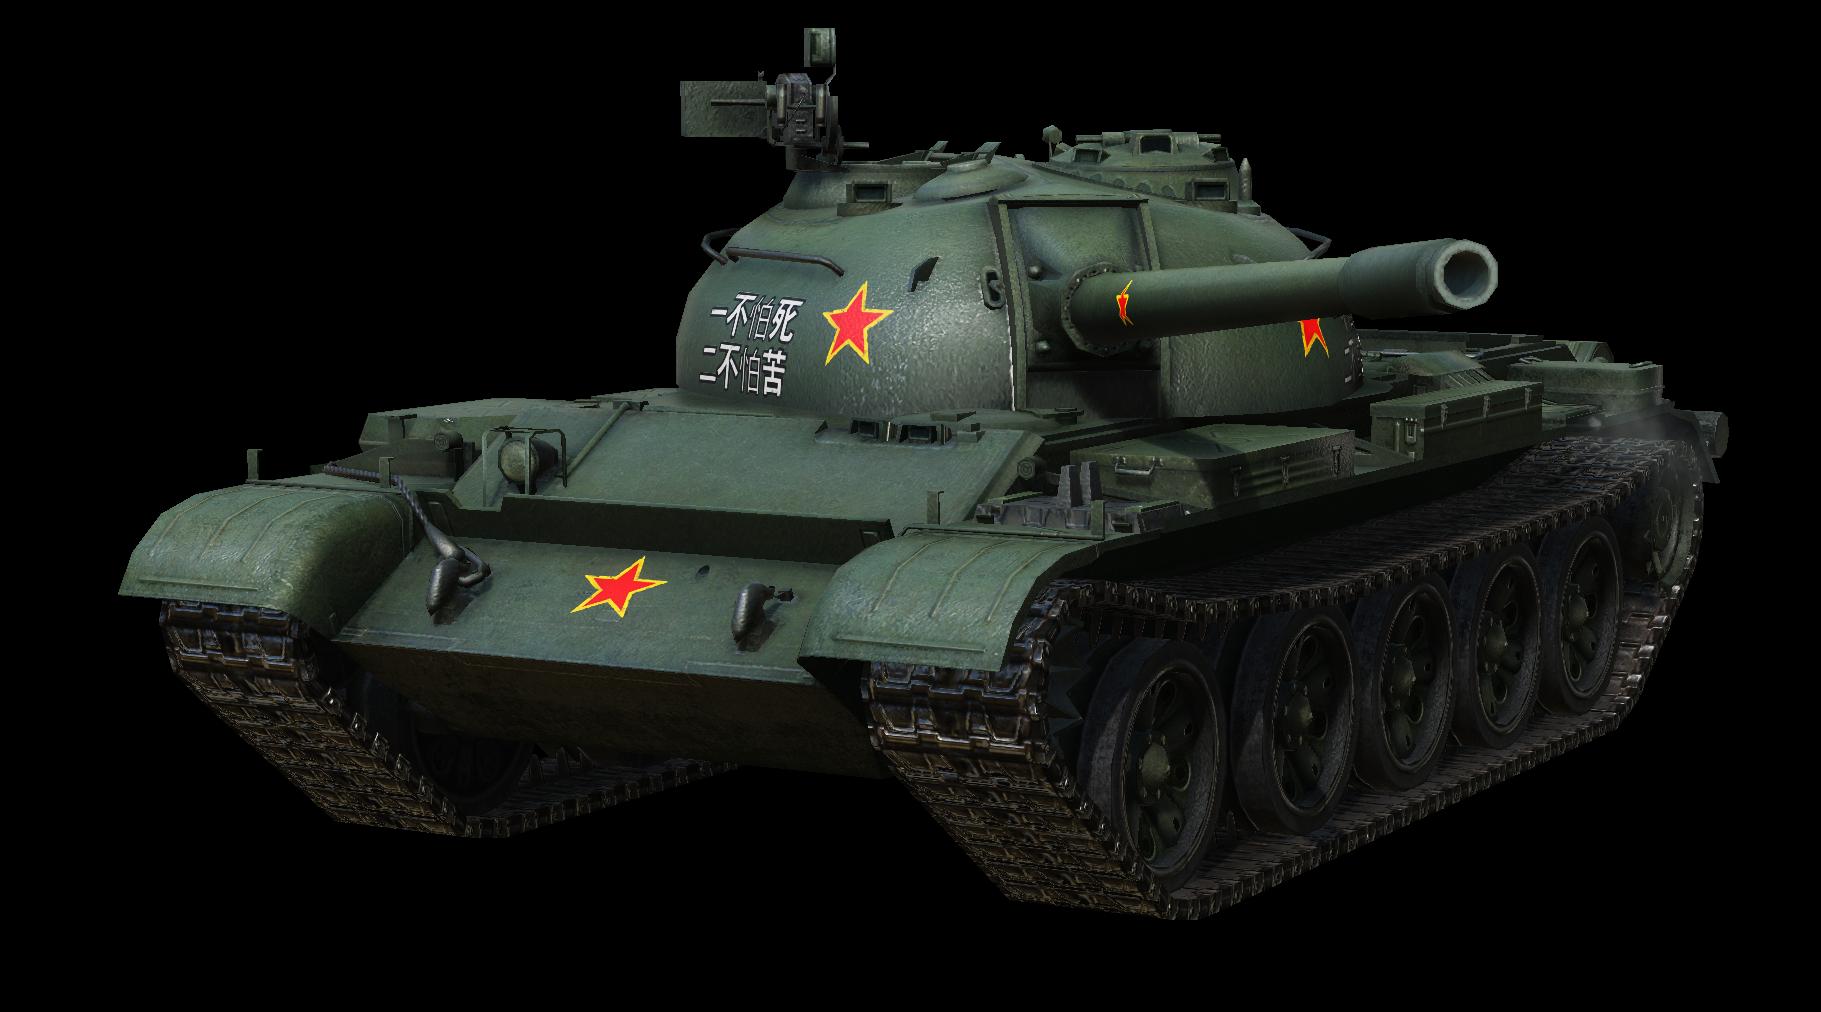 Tank Transparent Png - Tank, Transparent background PNG HD thumbnail